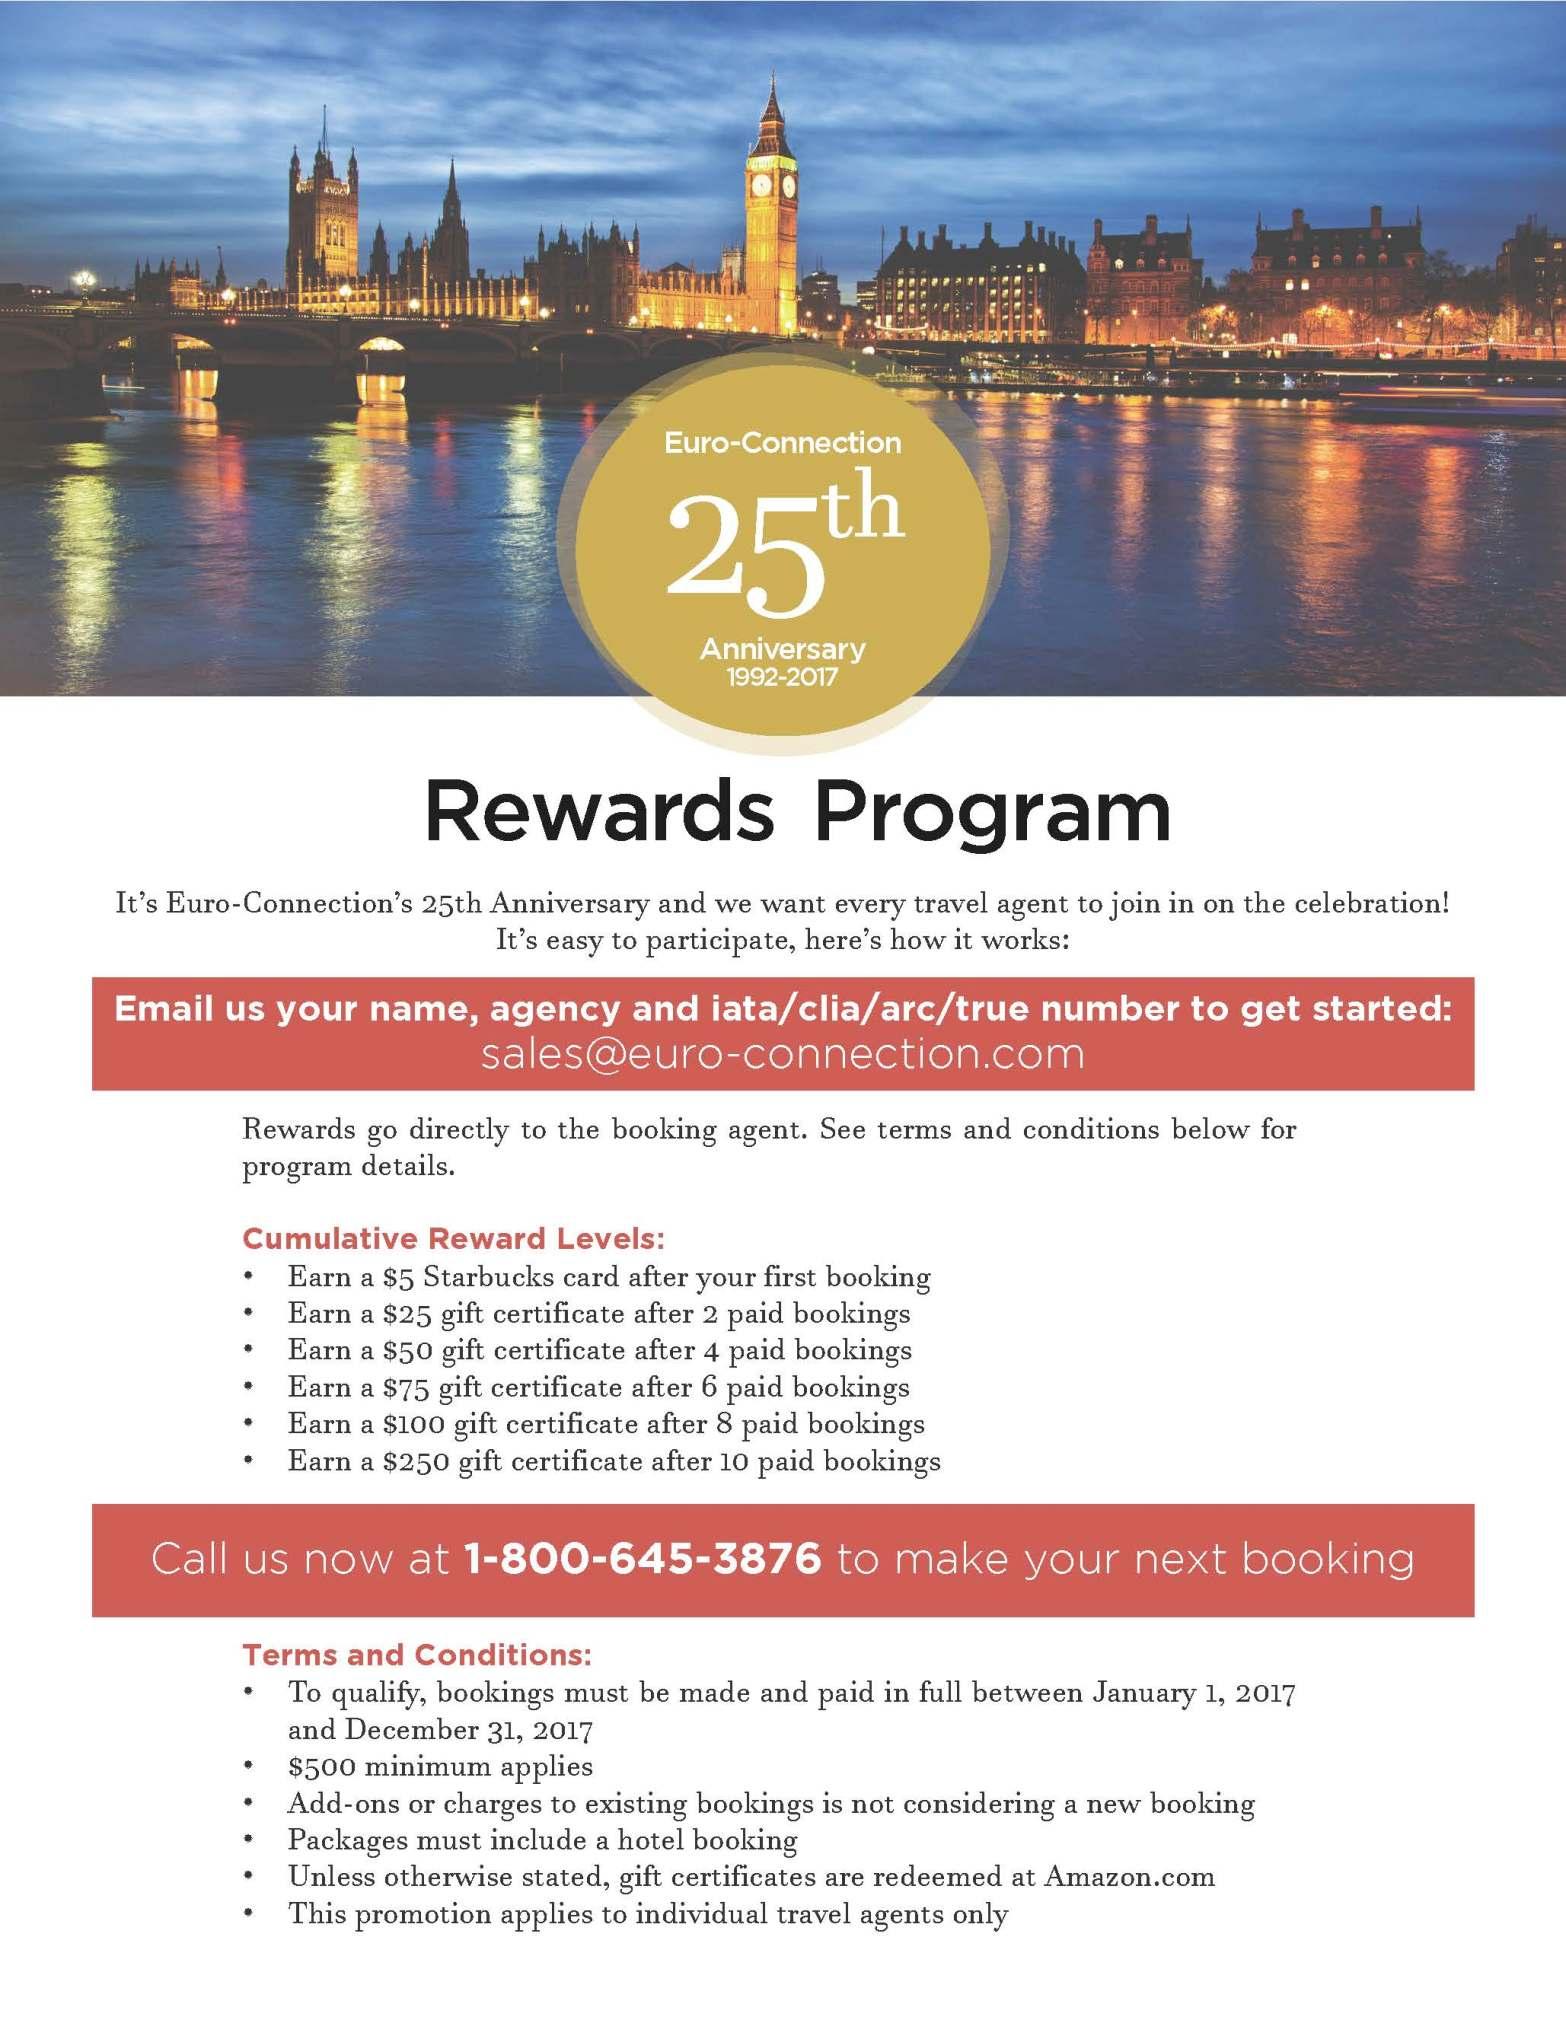 euro-connection-rewards